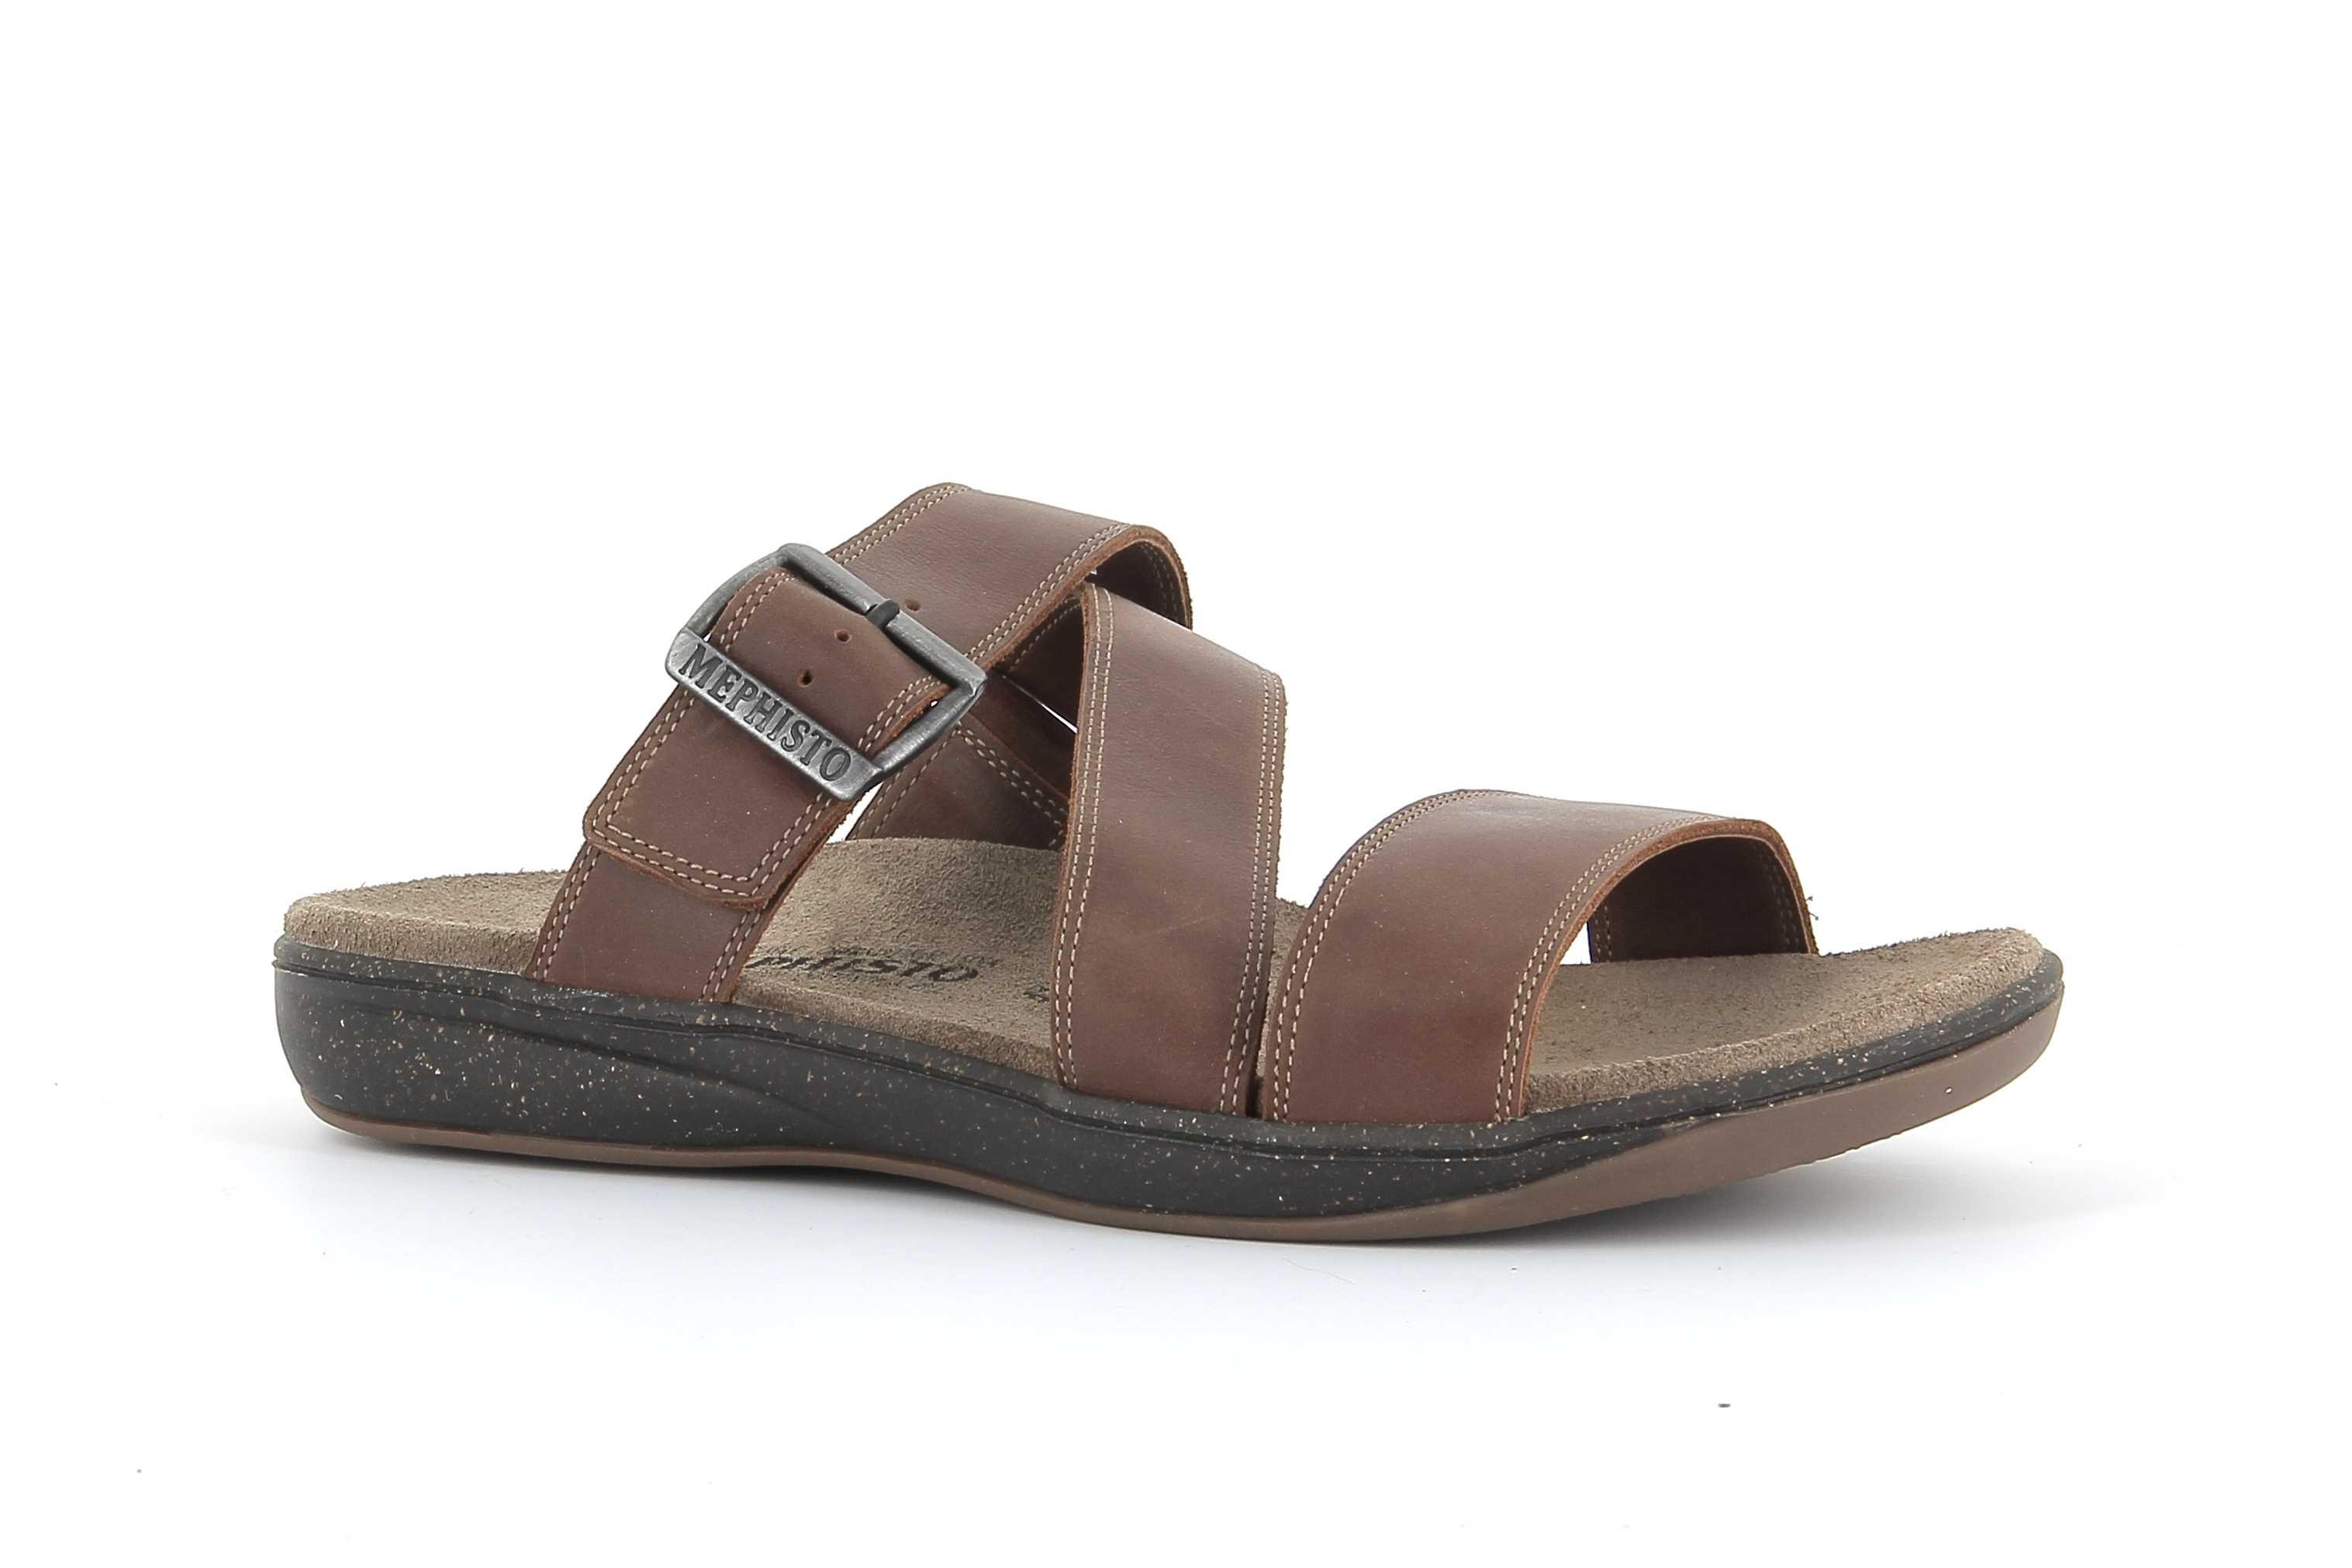 mephisto shop chaussures confortables sandales homme mod le steven. Black Bedroom Furniture Sets. Home Design Ideas